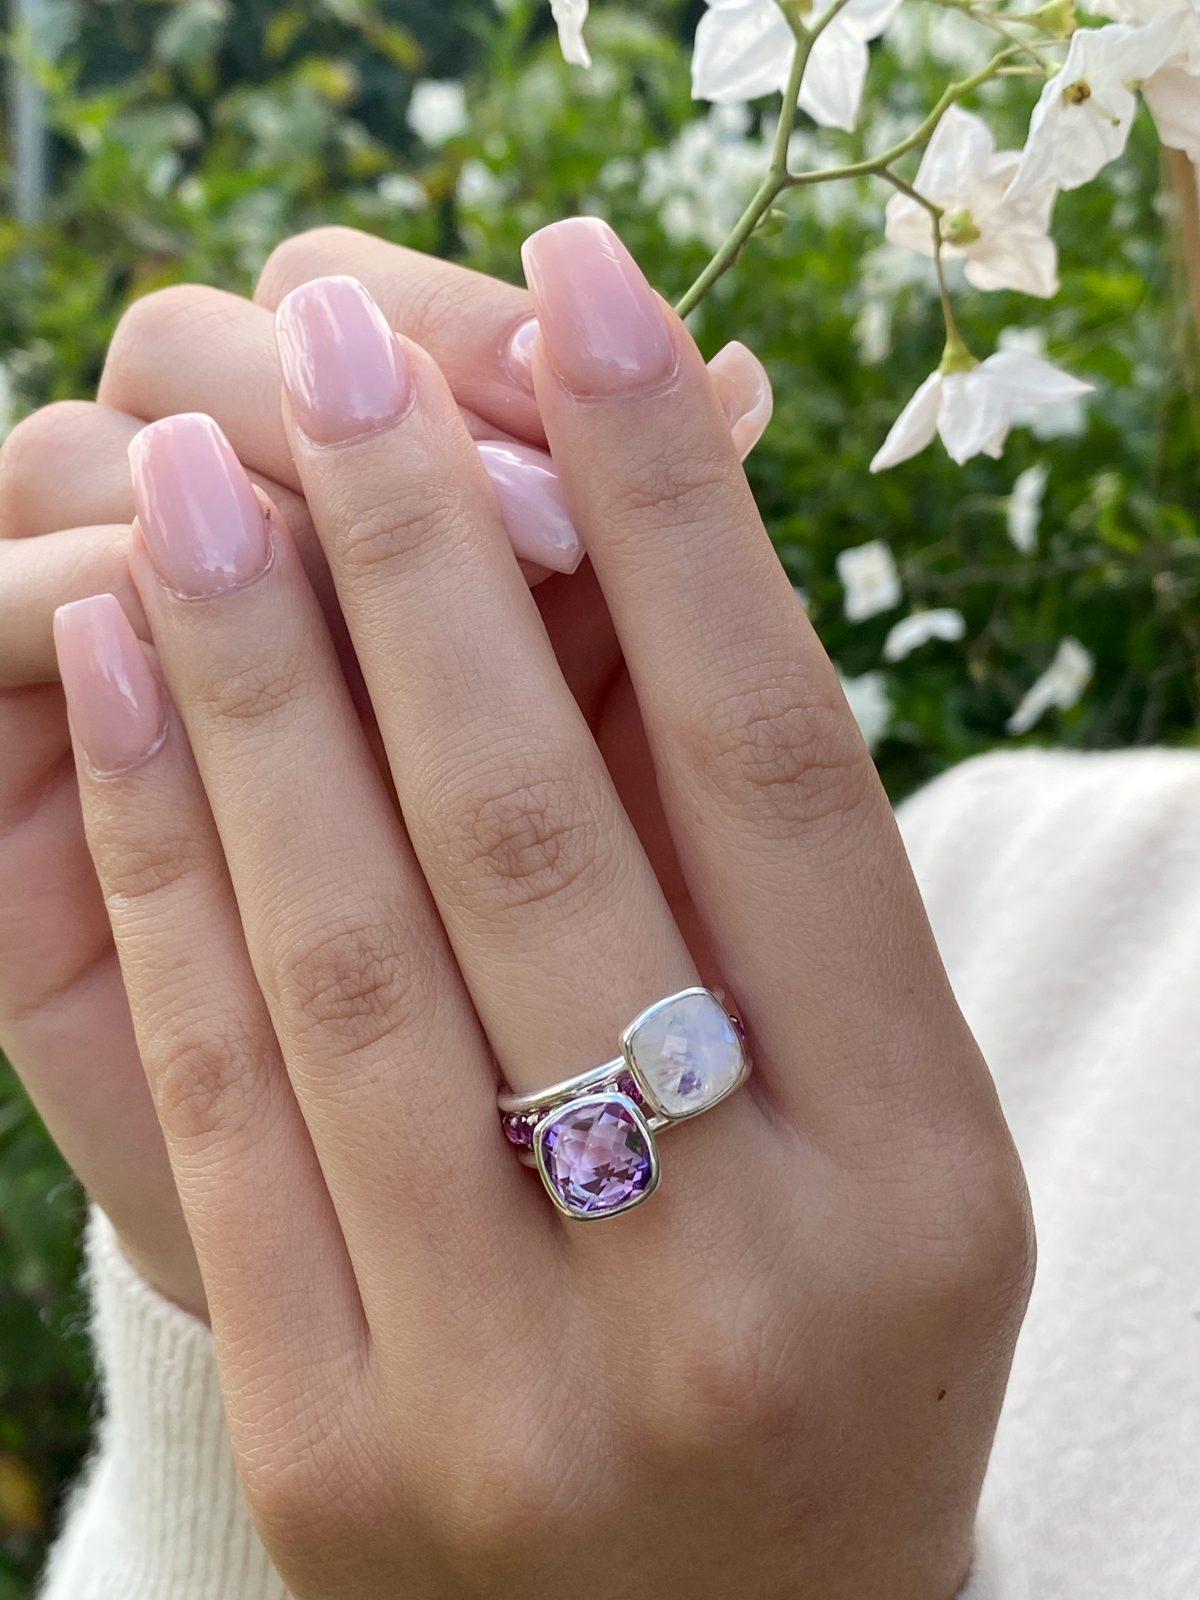 Rainbow Moonstone stacking ring, Cushion cut rainbow moonstone ring, stacking ring.